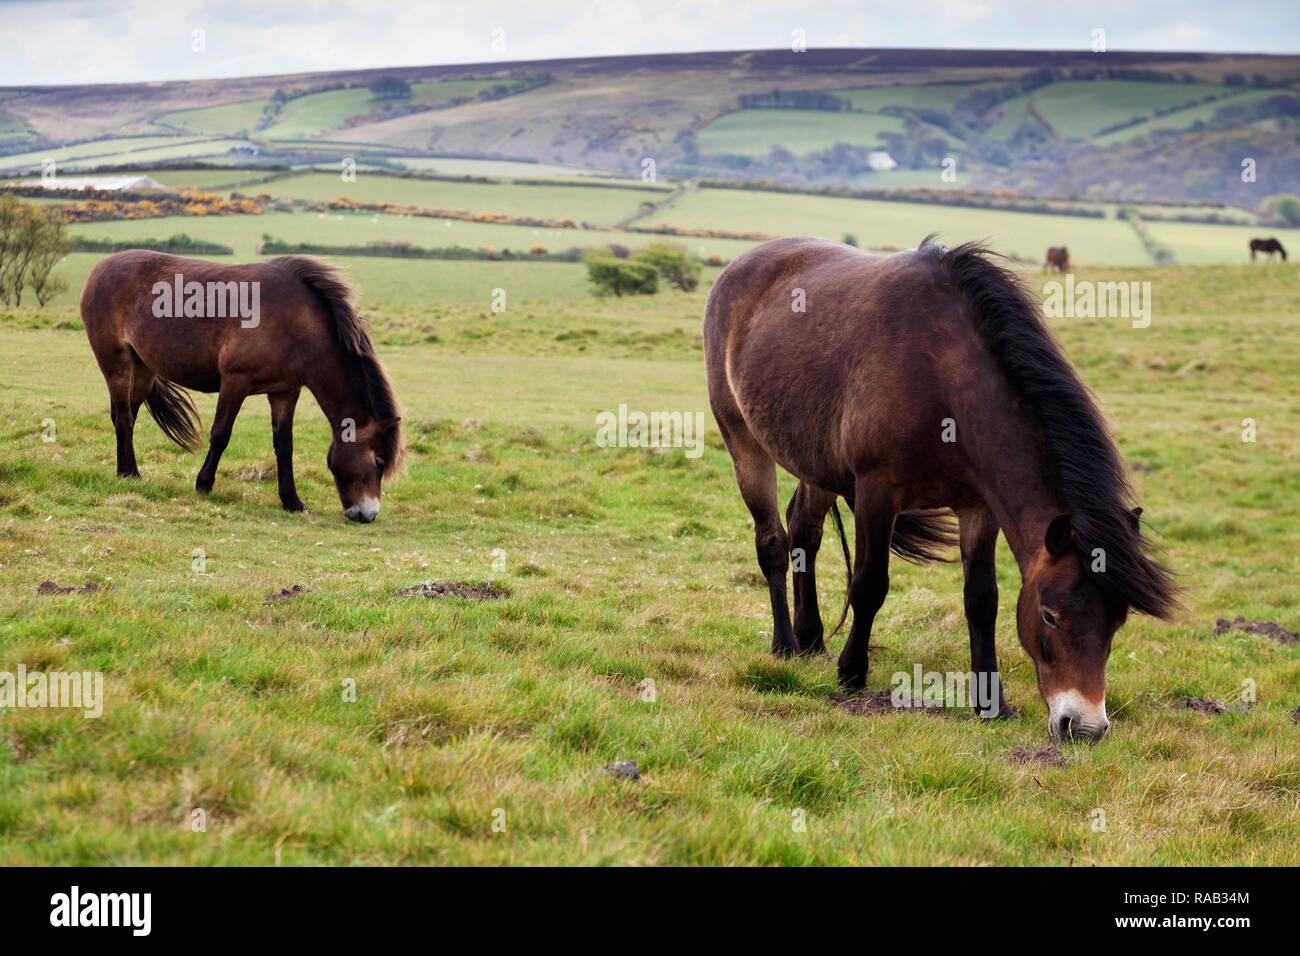 Wild Exmoor Ponies, Exmoor National Park, Devon, England, United Kingdom - Stock Image